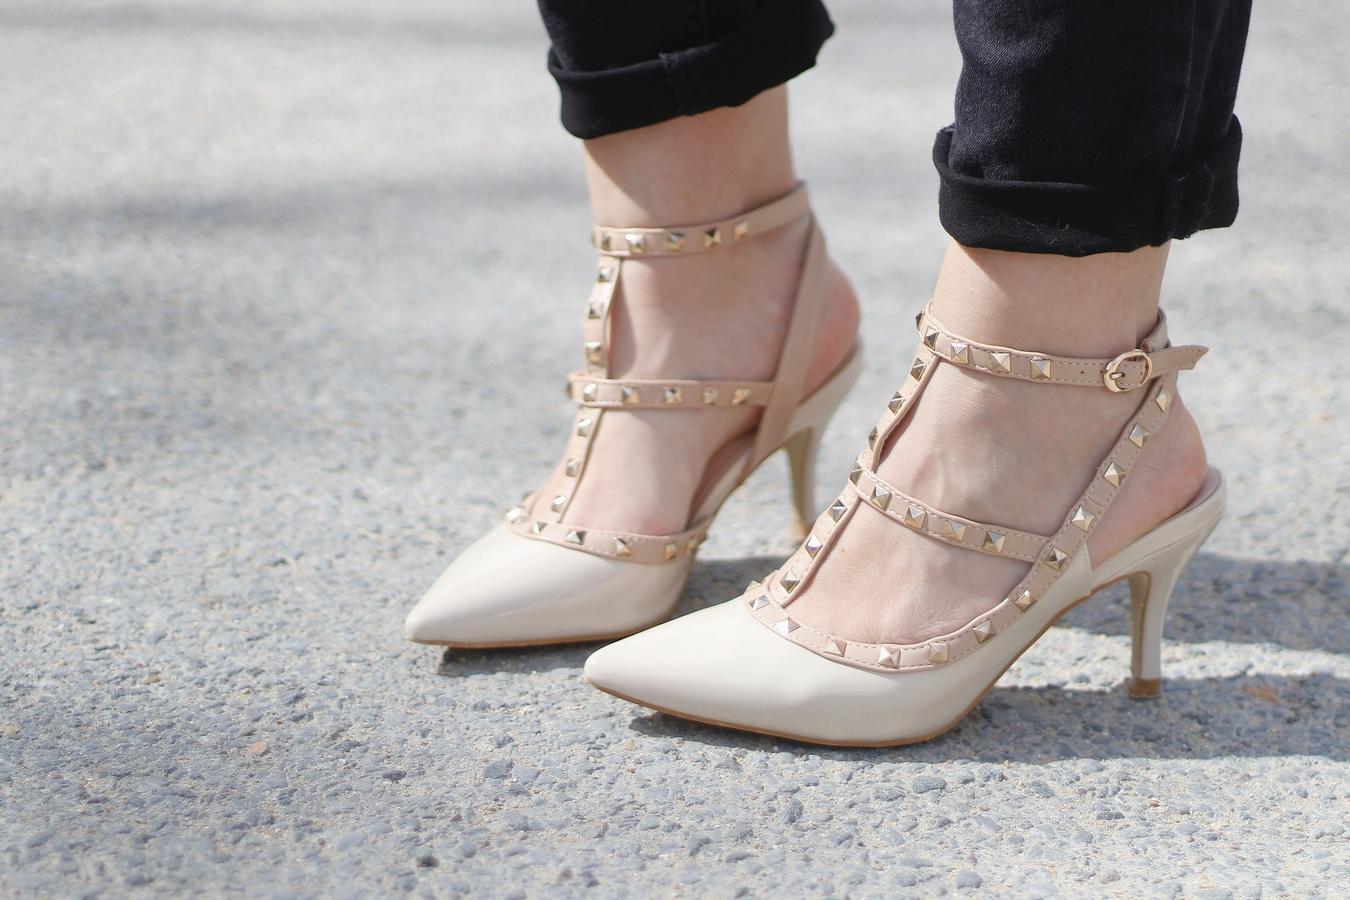 Blog mode femme Paris - Du style, Madame - Streetstyle - la modeuse - valentino - rockstud